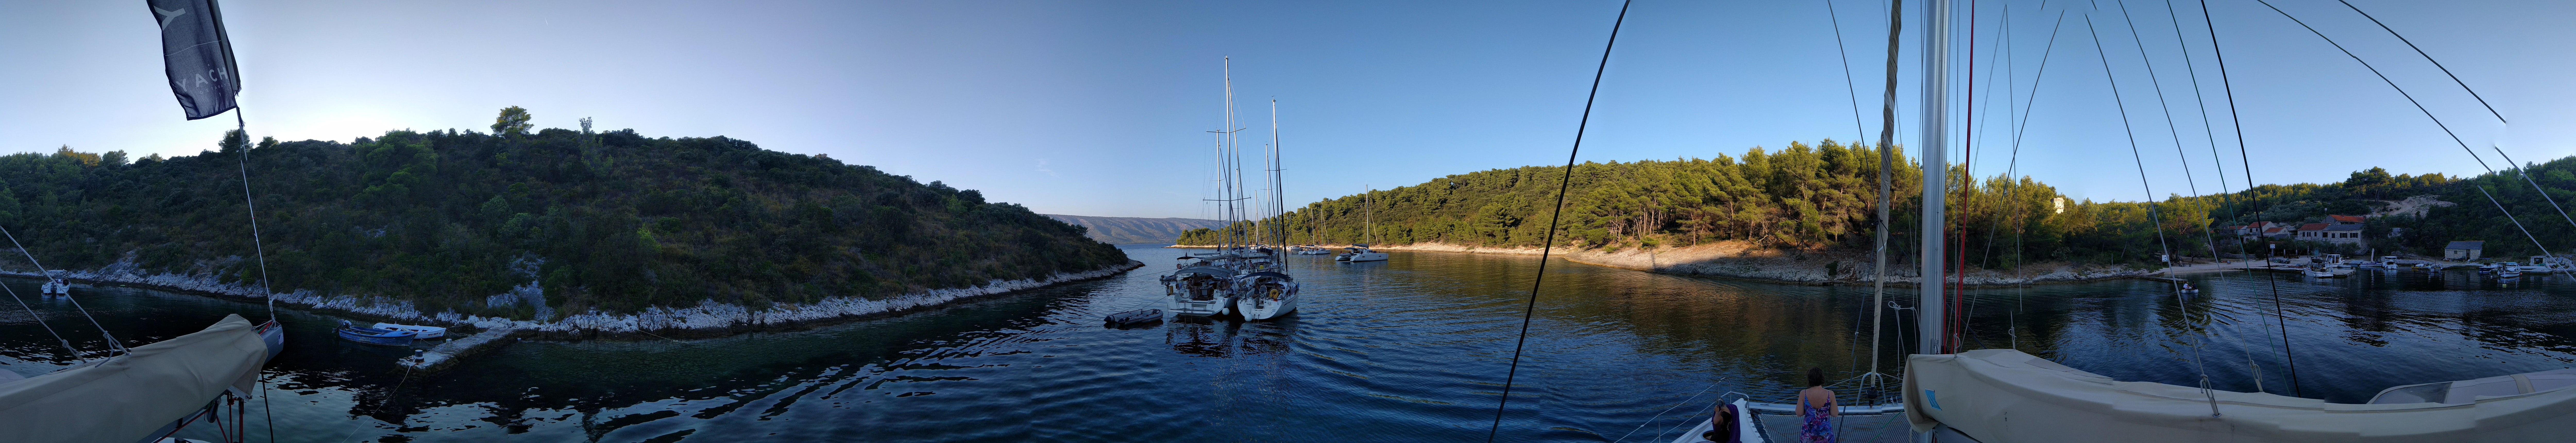 pano-scedro-croatia